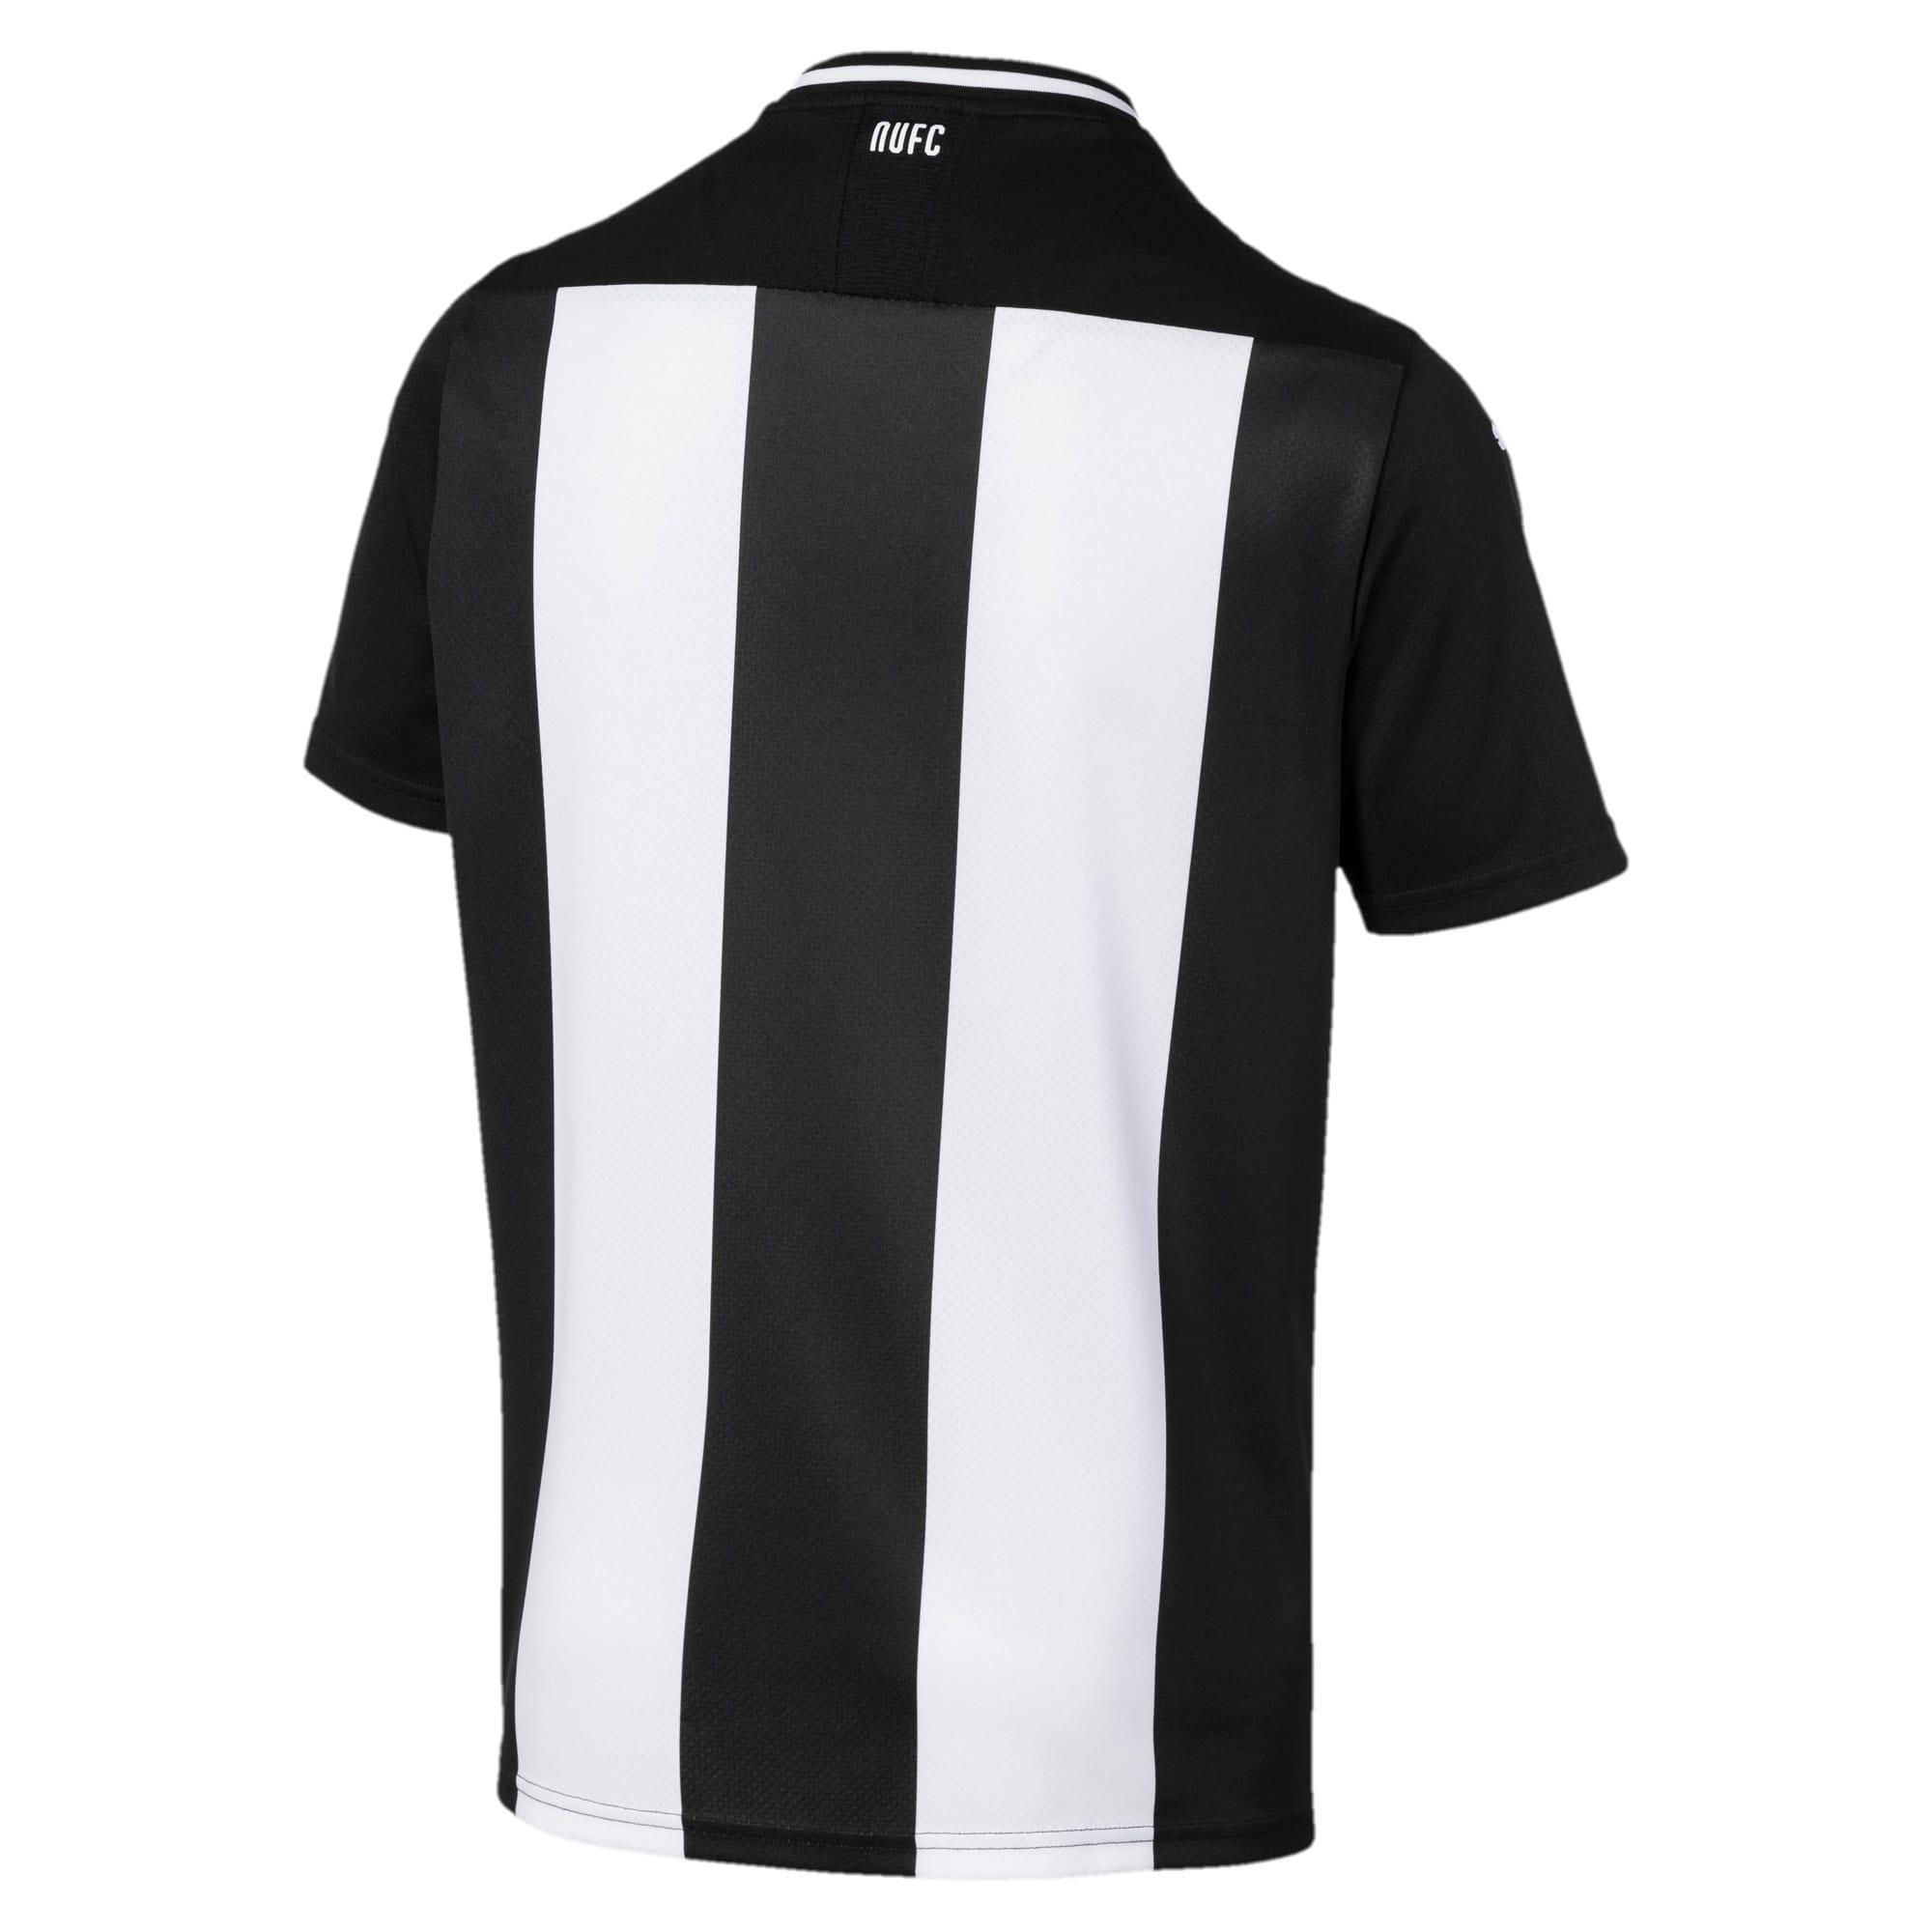 Thumbnail 2 of Newcastle United FC Herren Replica Heimtrikot, Puma White-Puma Black, medium